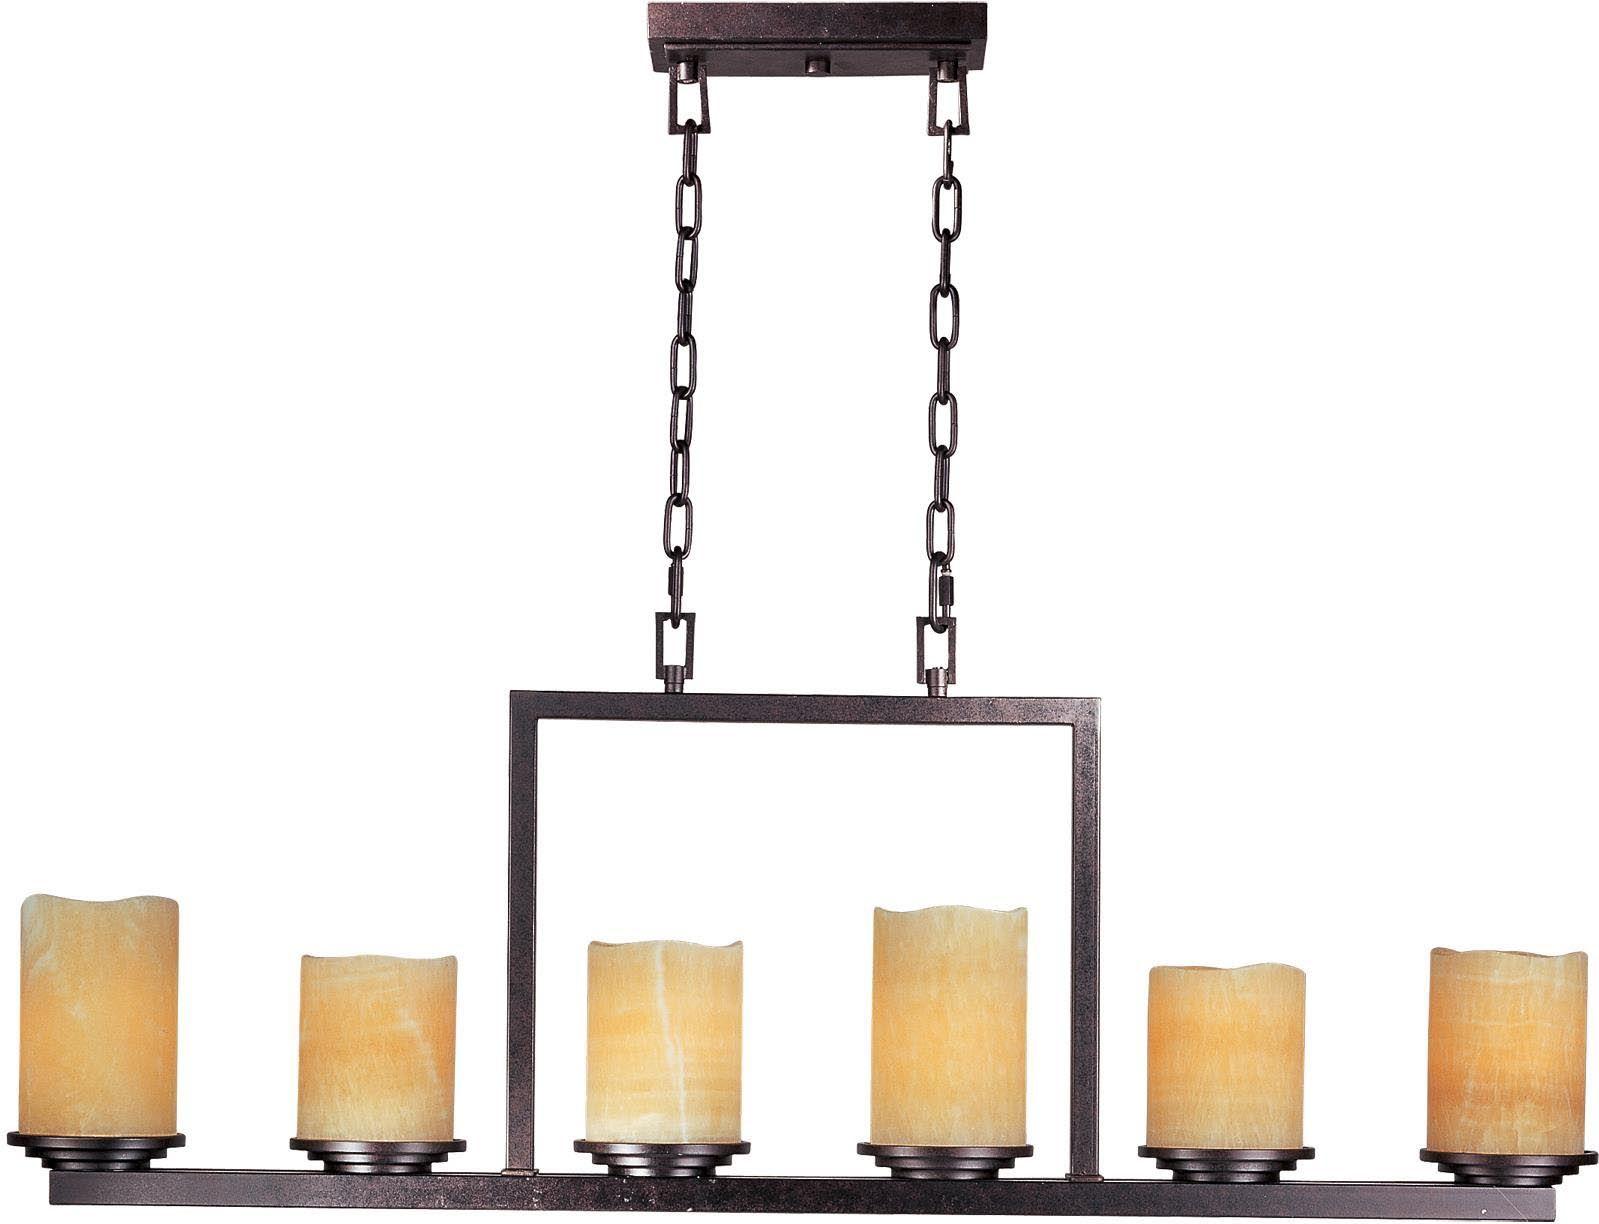 Rectangular bronze pillar candle chandelier chandeliers rectangular bronze pillar candle chandelier aloadofball Image collections